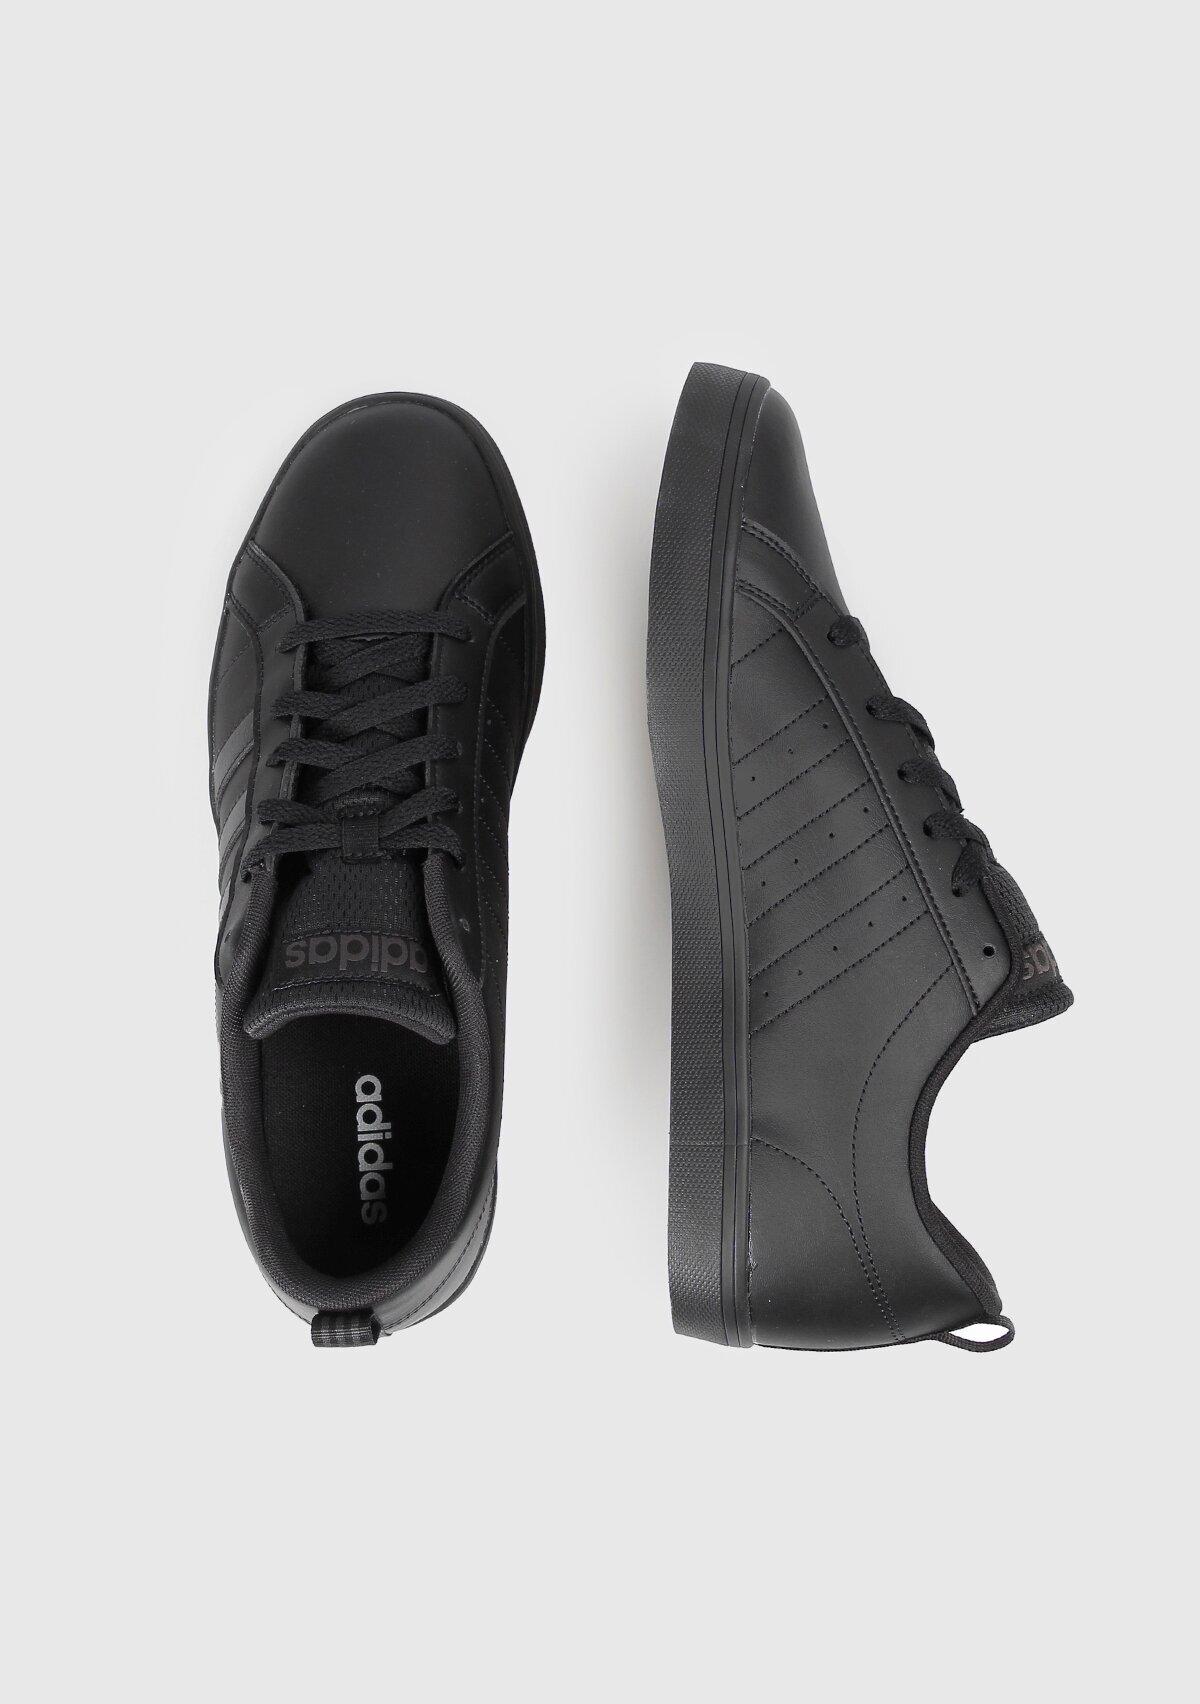 resm Vs Pace Siyah Erkek Tenis Ayakkabısı B44869